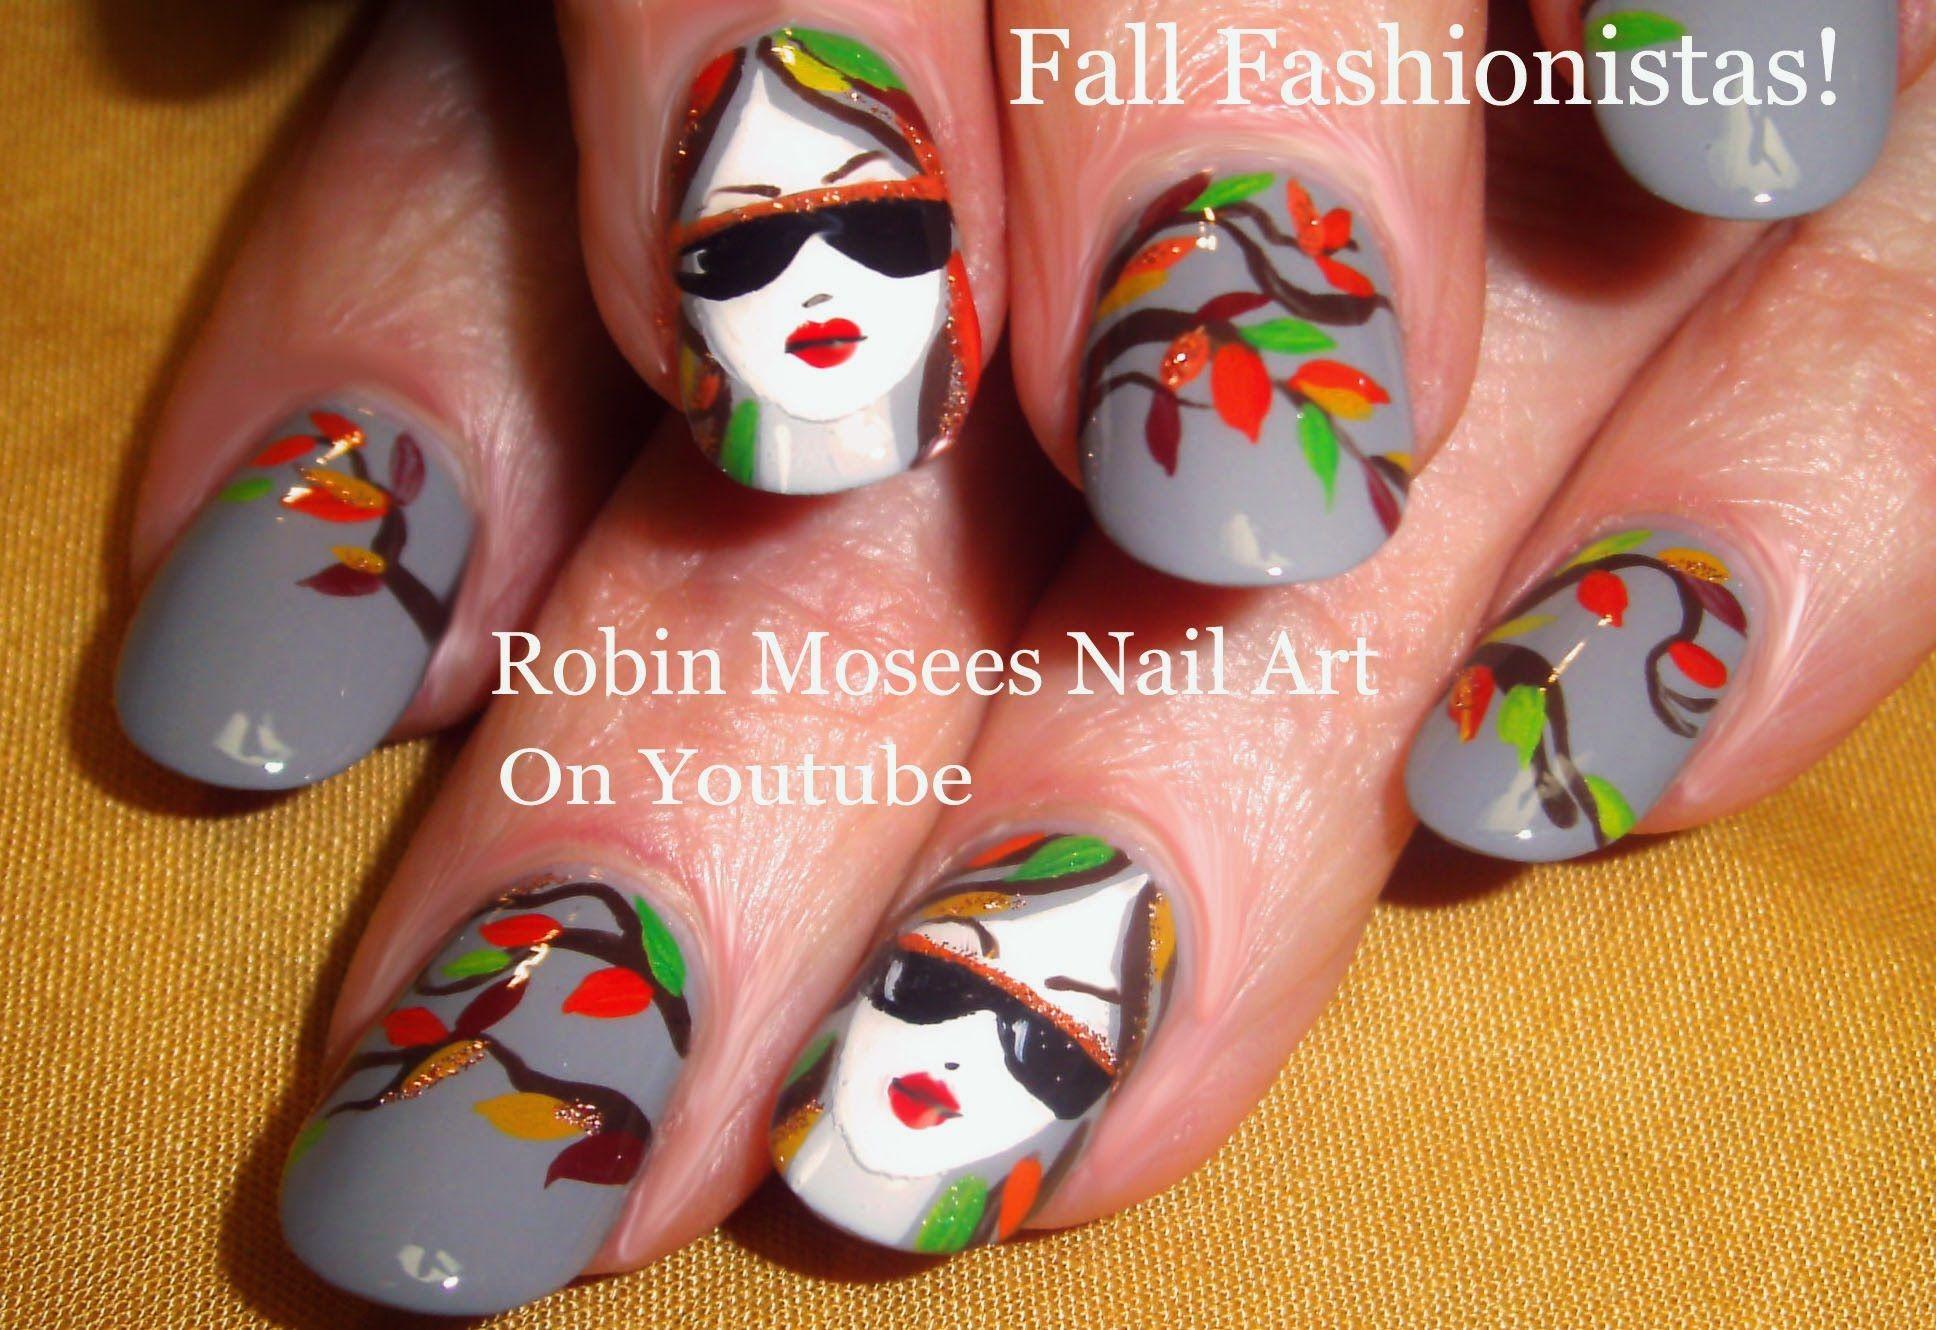 Fall Fashionistas! #nailart #nails #art #nail #design #elegant #graynails #fallnails #fallnailart #autumn #fall #fashionistas #fashion #cute #trends